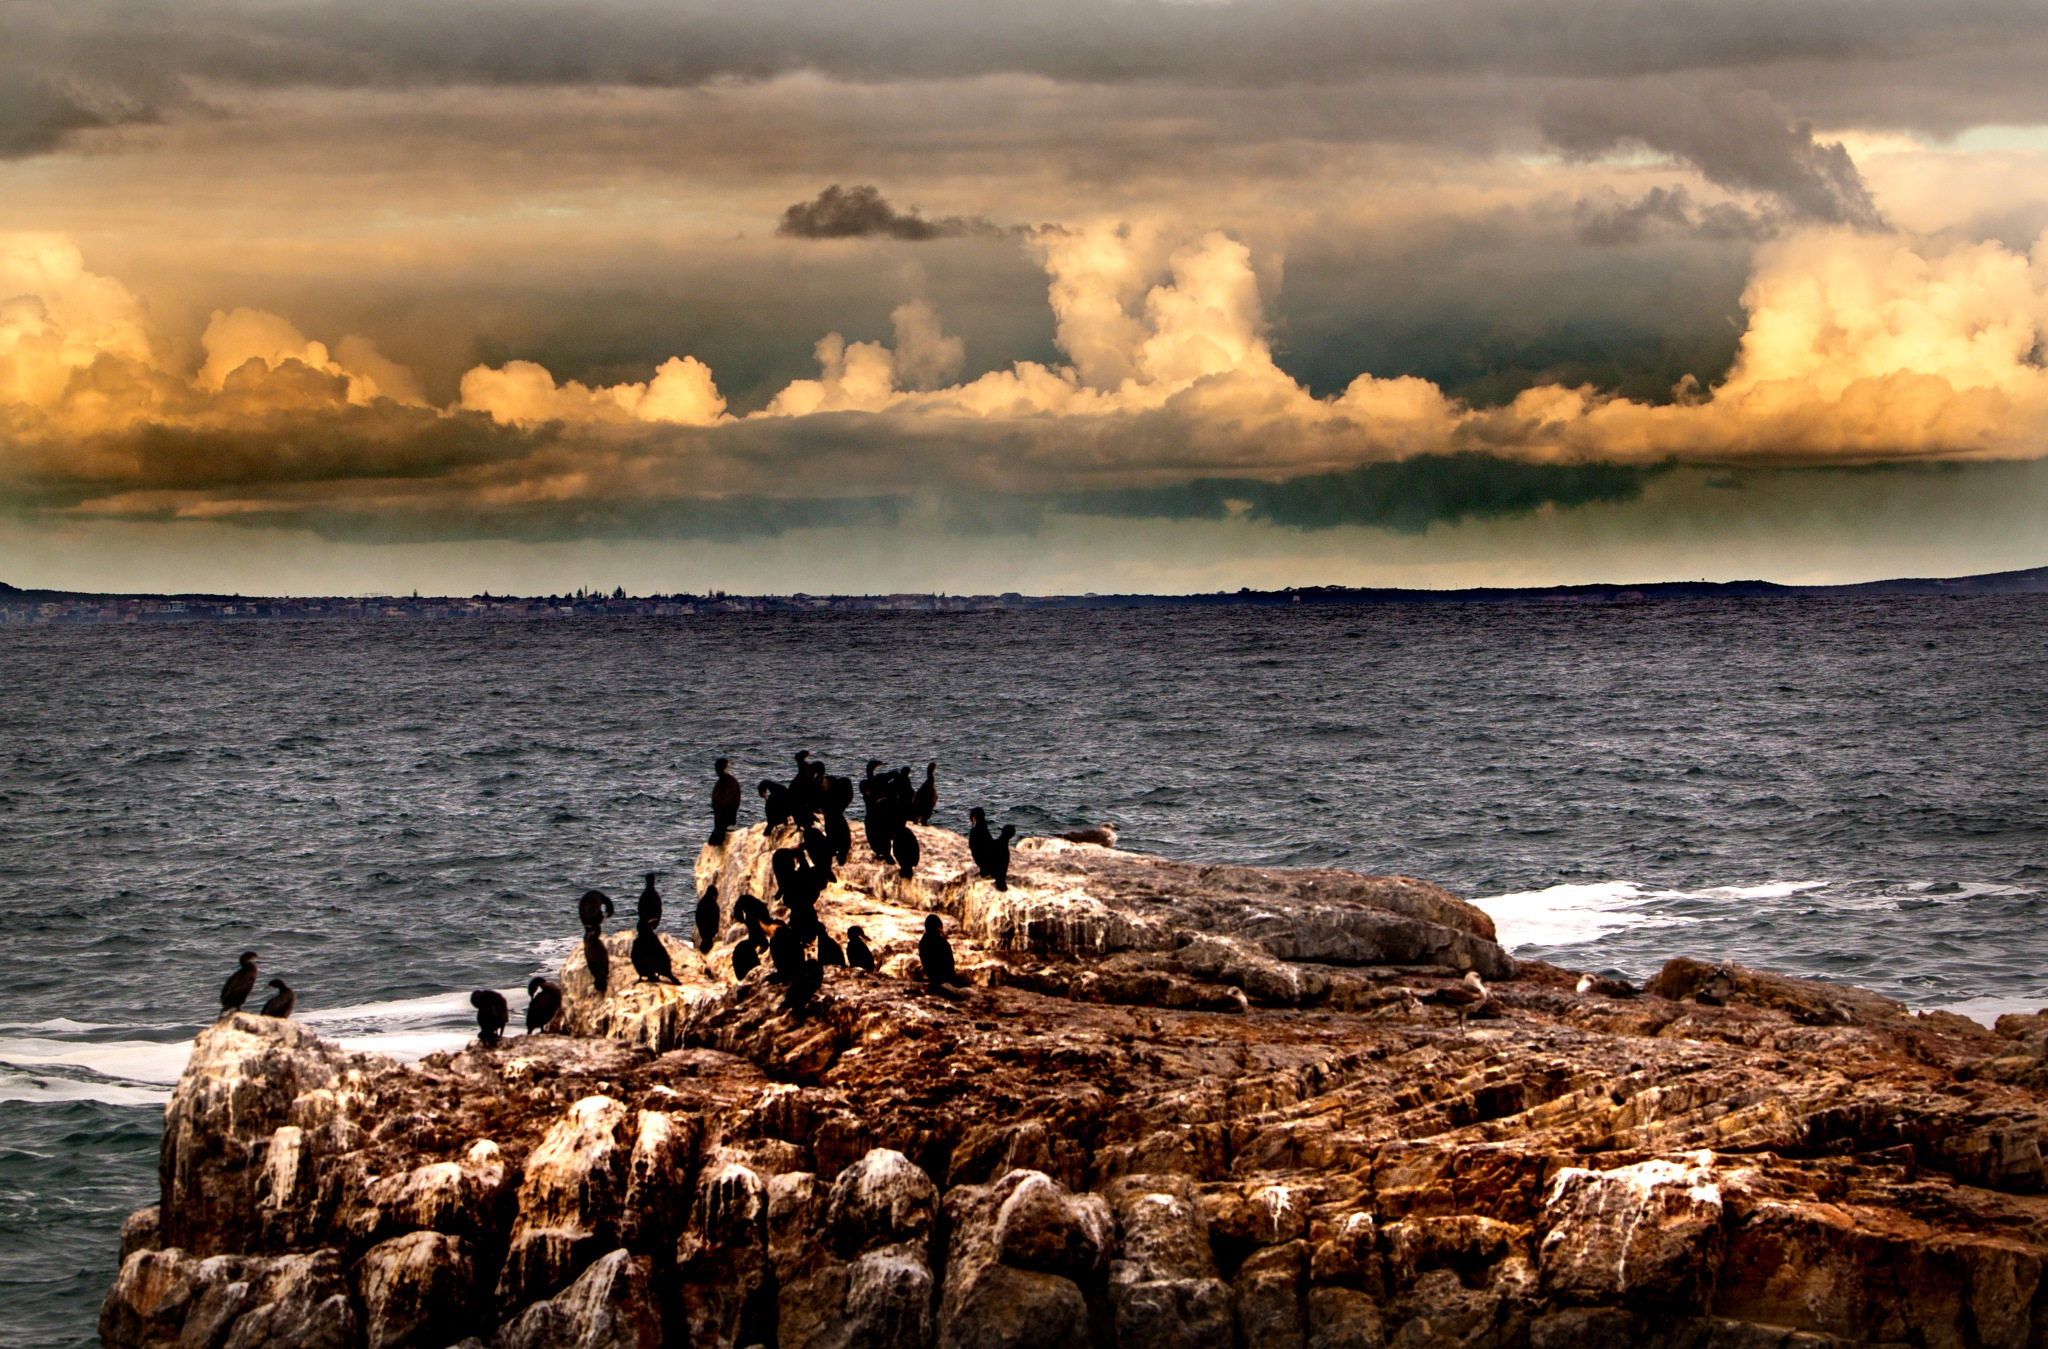 Gannets on a rock by Nauta Piscatorque